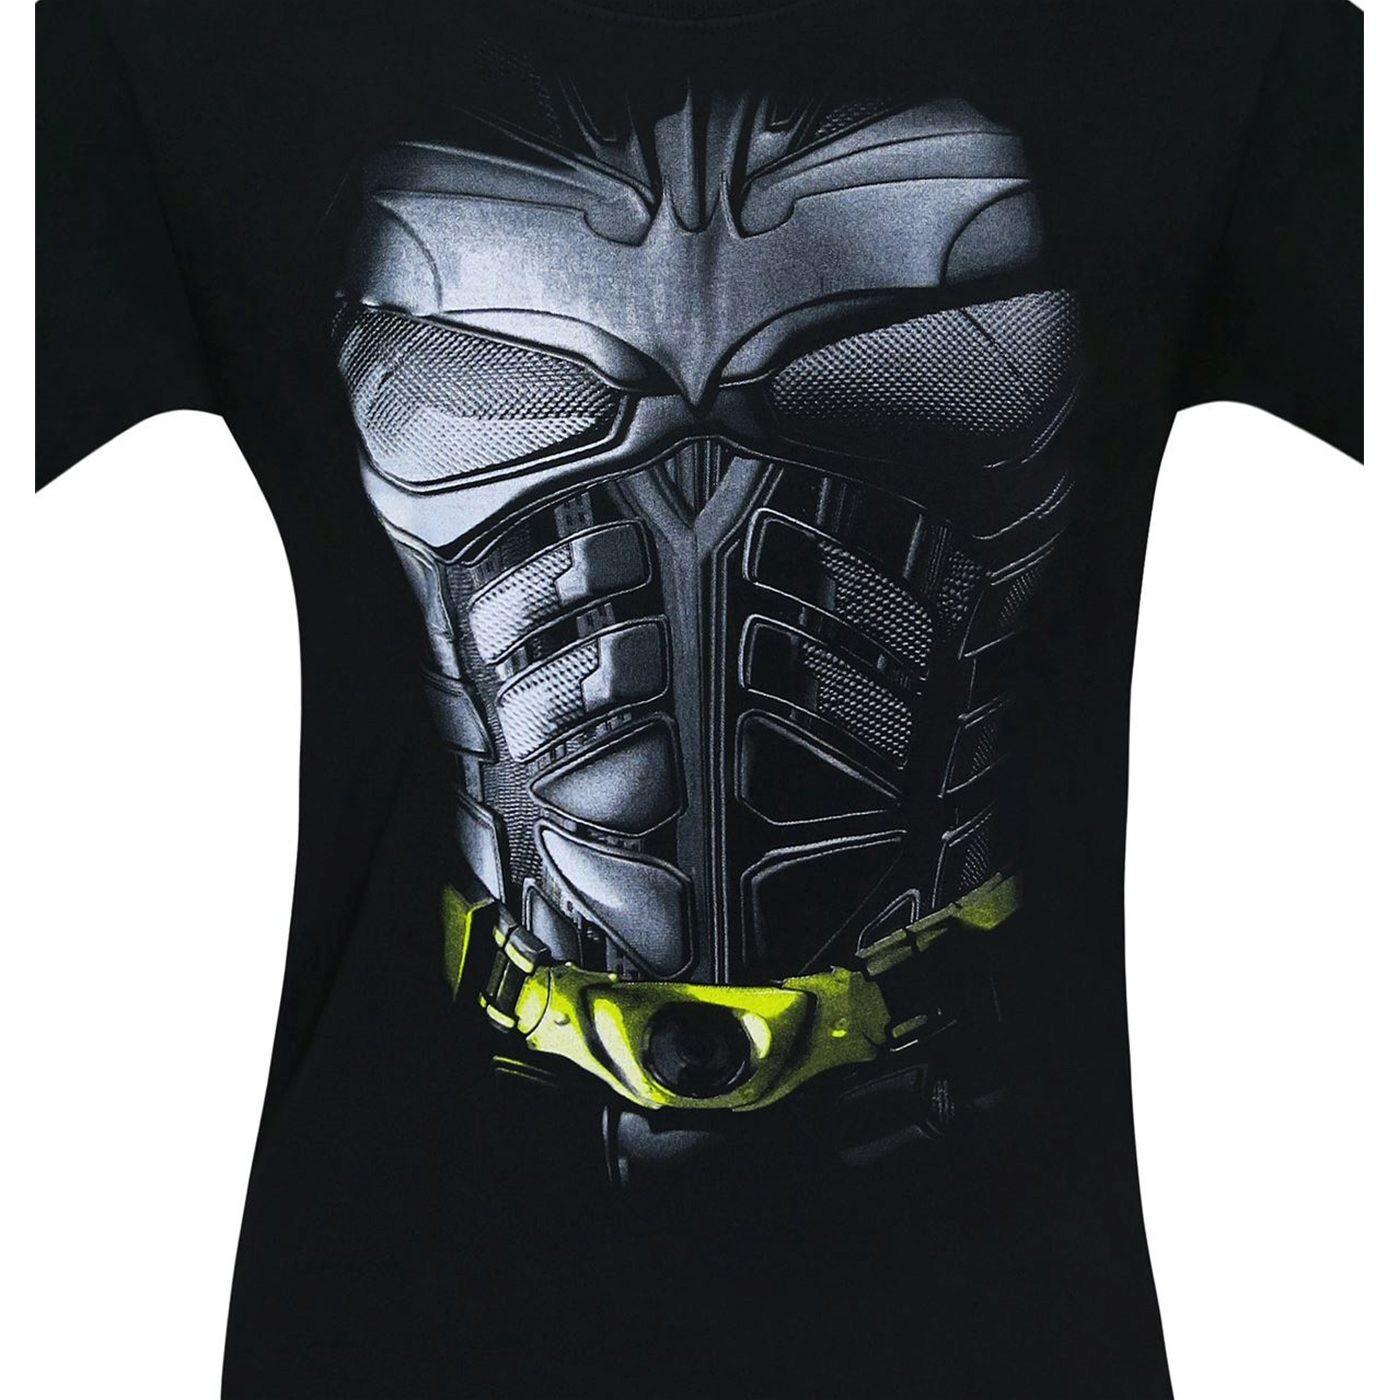 Batman Dark Knight Movie Armor Costume Men's T-Shirt